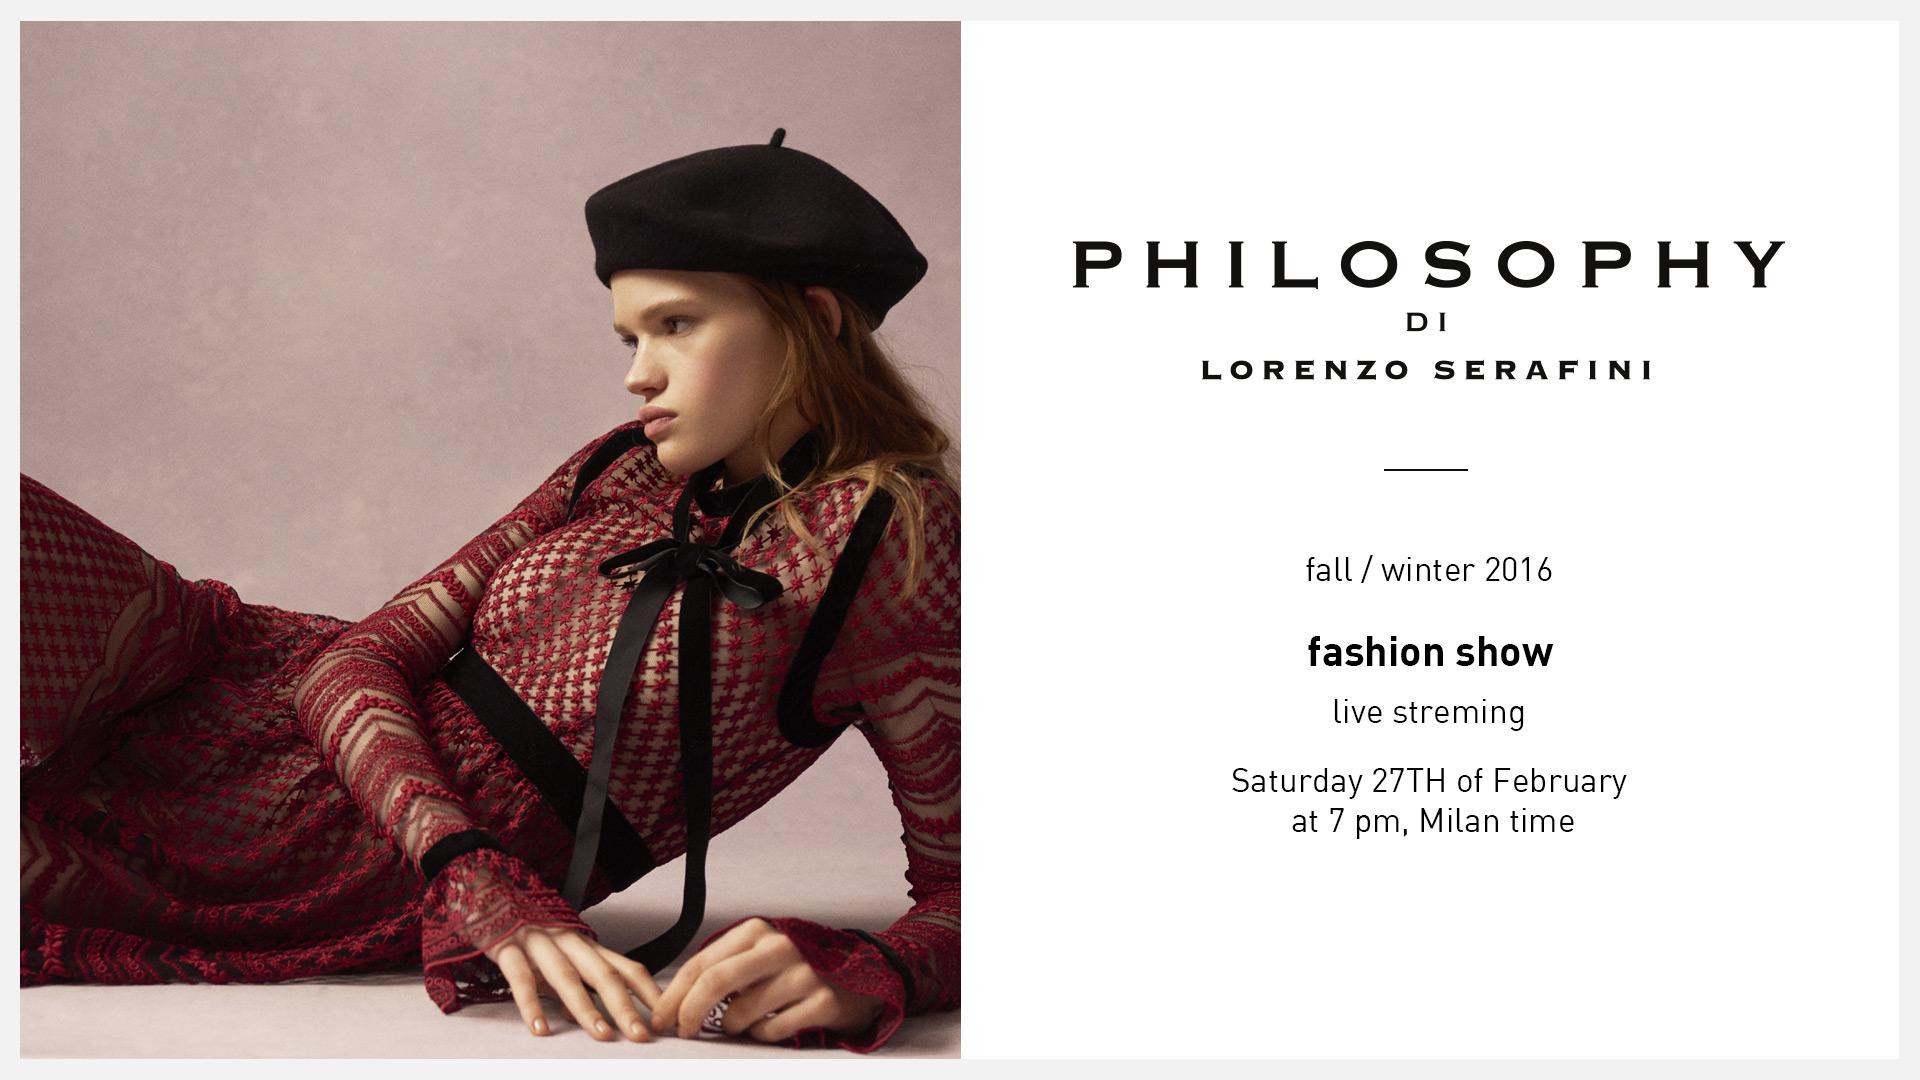 Philosophy di Lorenzo Serafini Fall Winter 2016 Women's Fashion Show Live StreamingPhilosophy di Lorenzo Serafini Fall Winter 2016 Women s Fashion Show Live Streaming